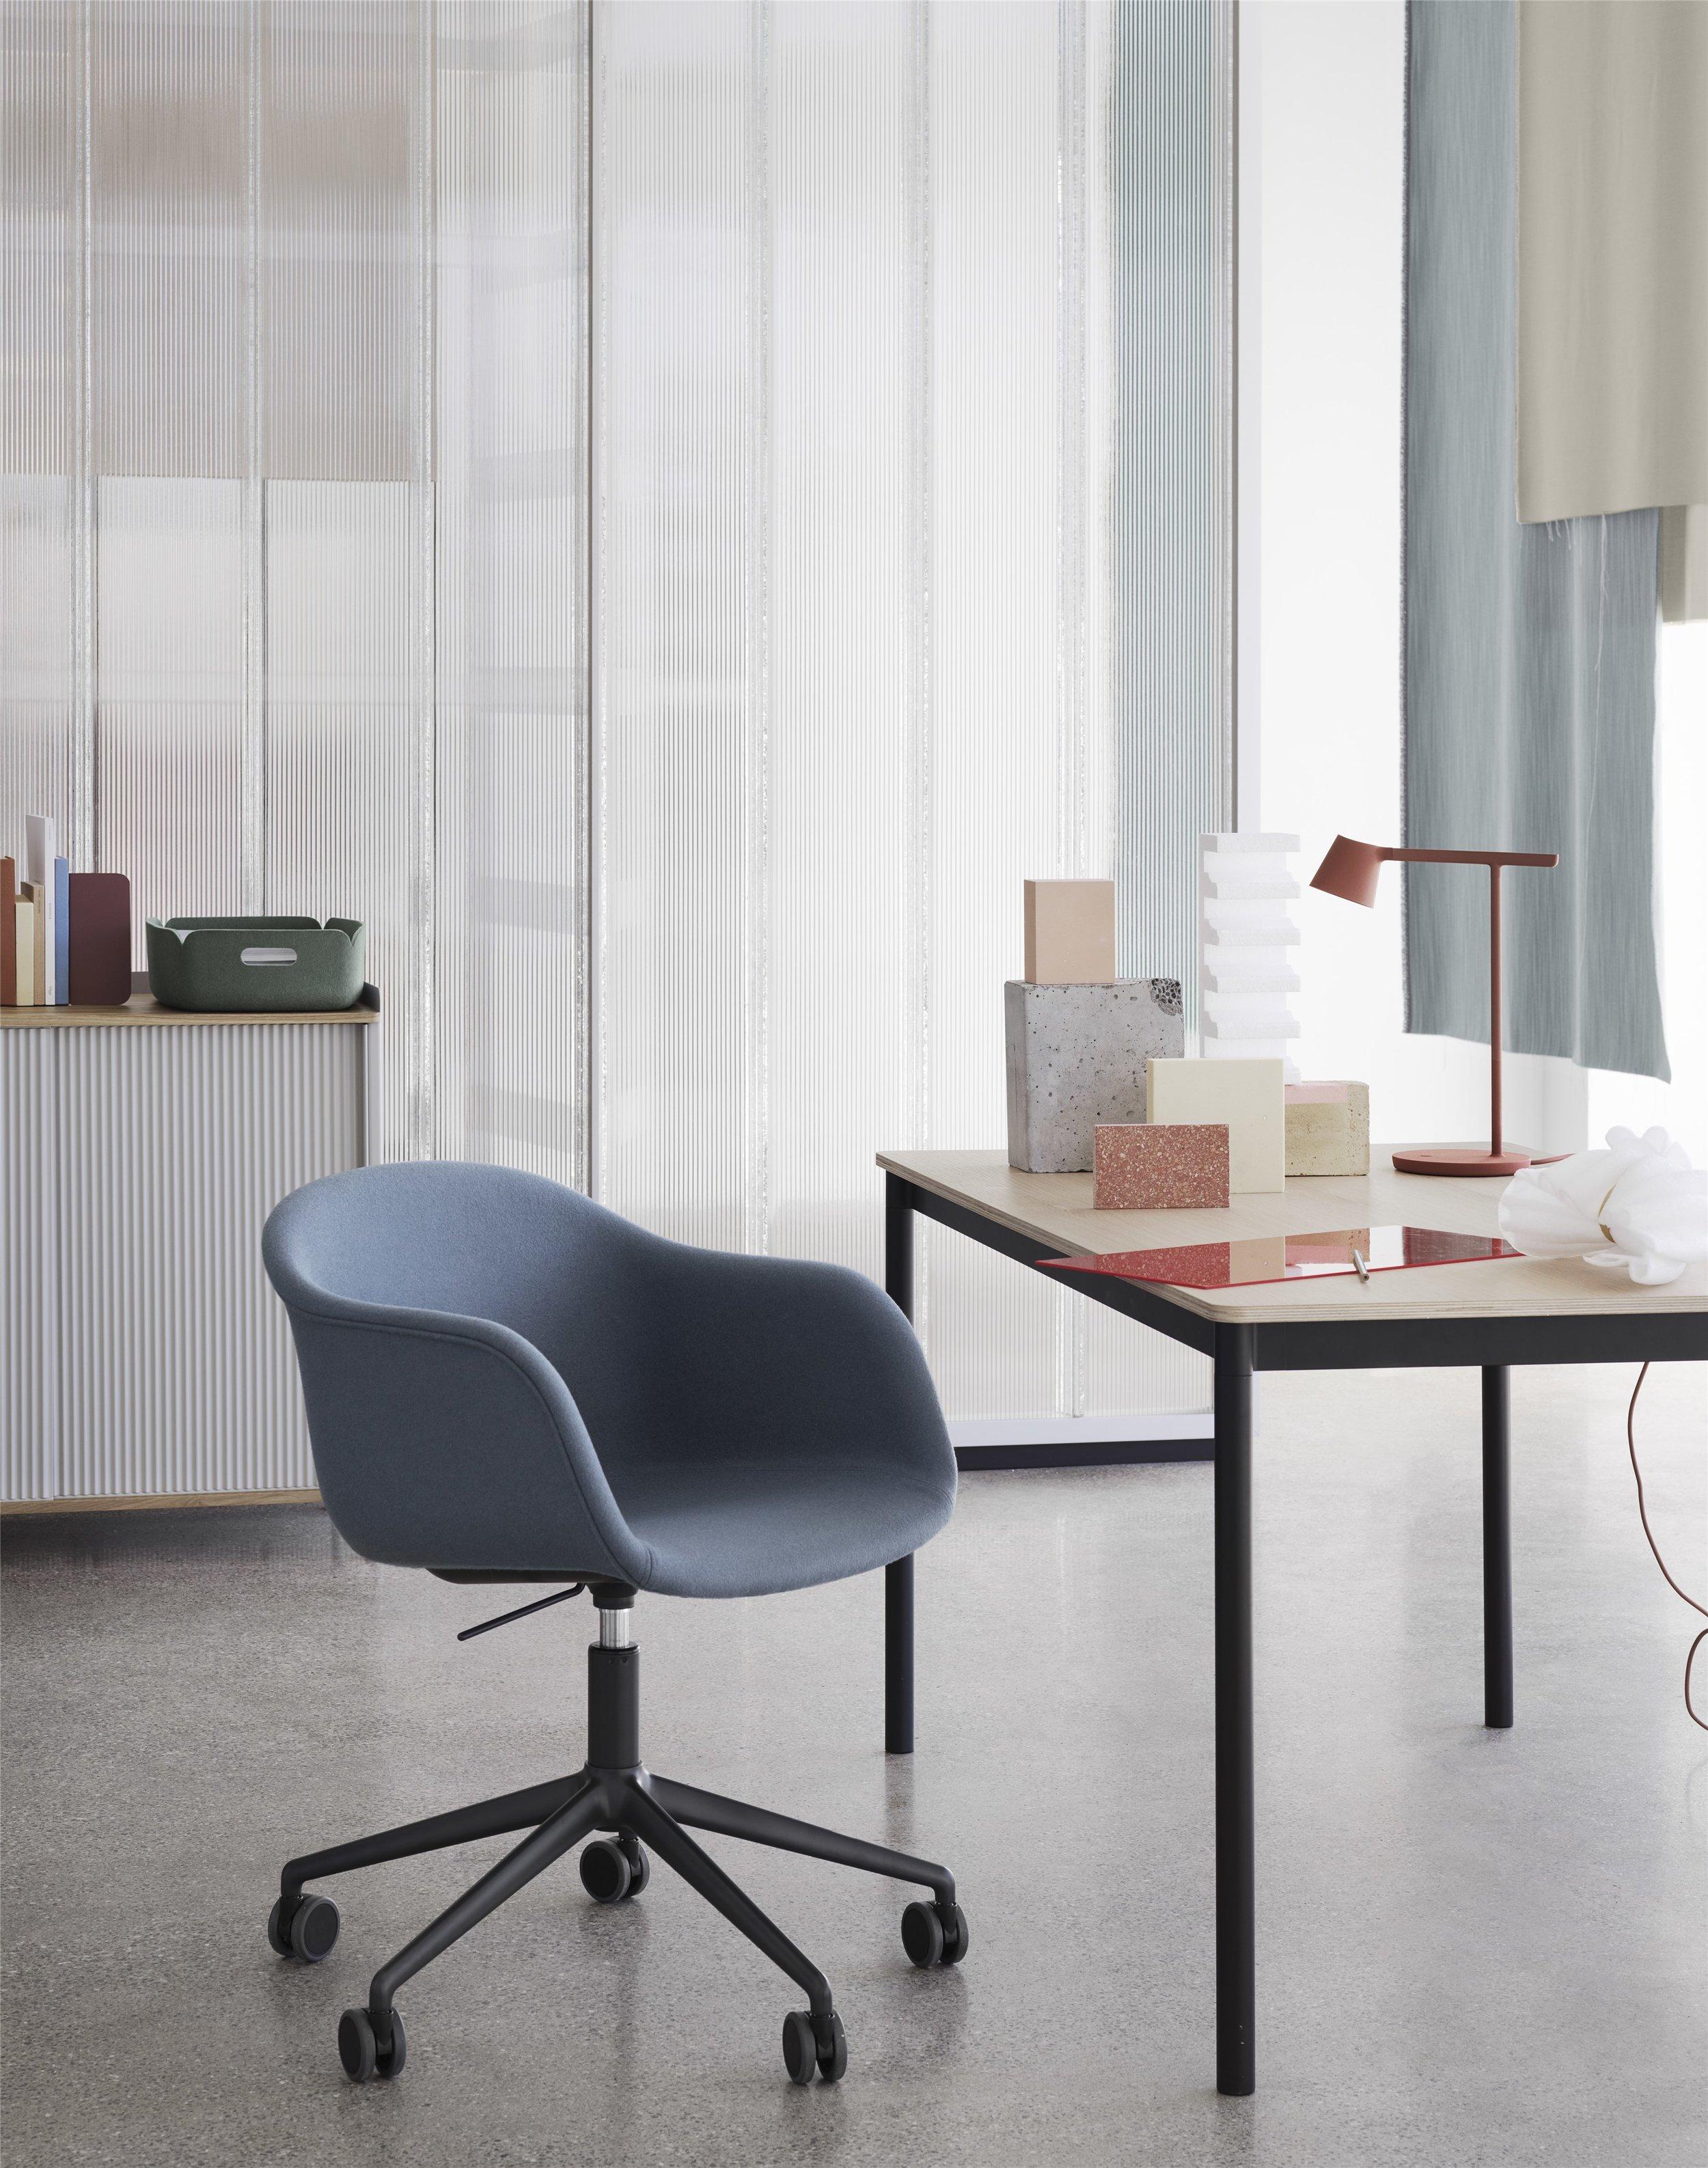 Fiber-armchair-gaslift-divina-154-base-table-tip-enfold-muuto-org_(150).jpg